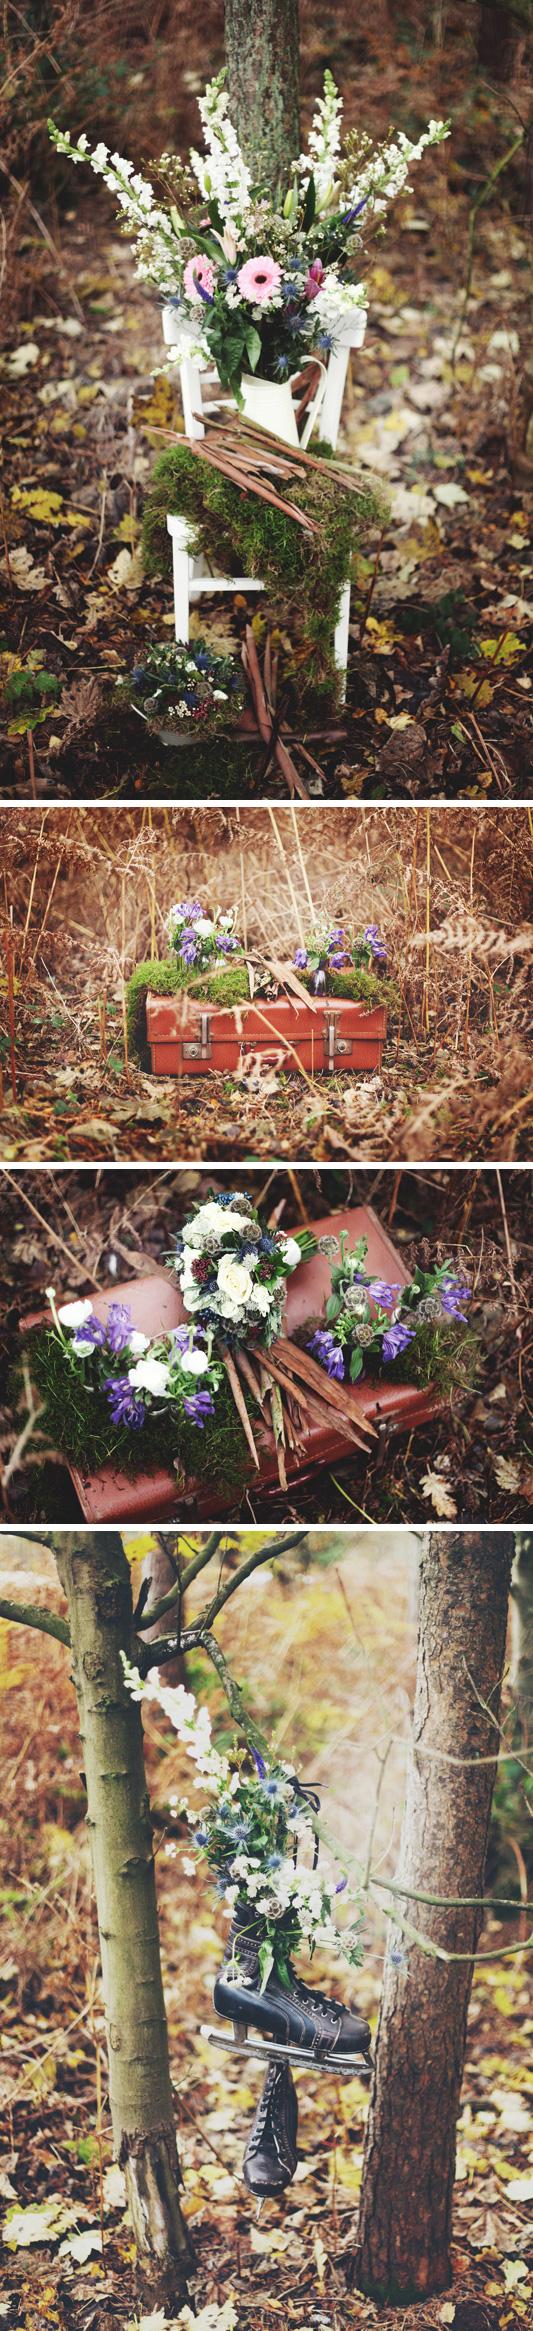 woodland-picnic-shoot3